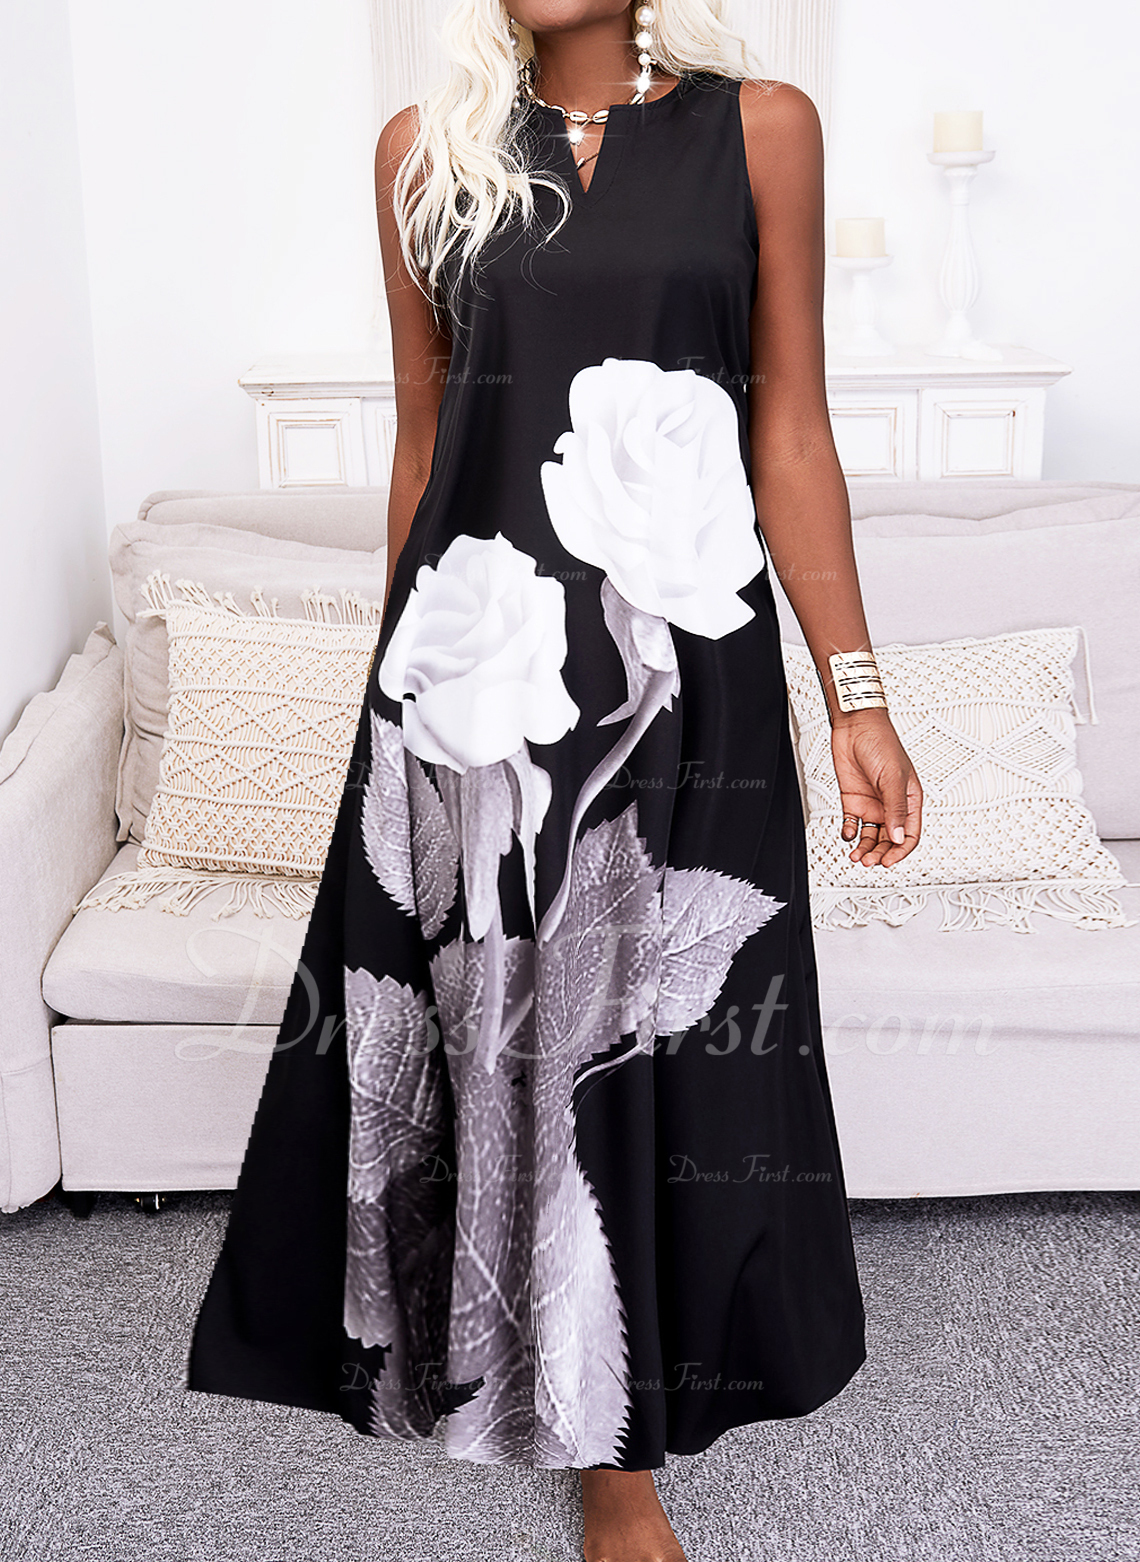 Floral Impresión Vestidos sueltos Sin mangas Maxi Casual Vestidos de moda